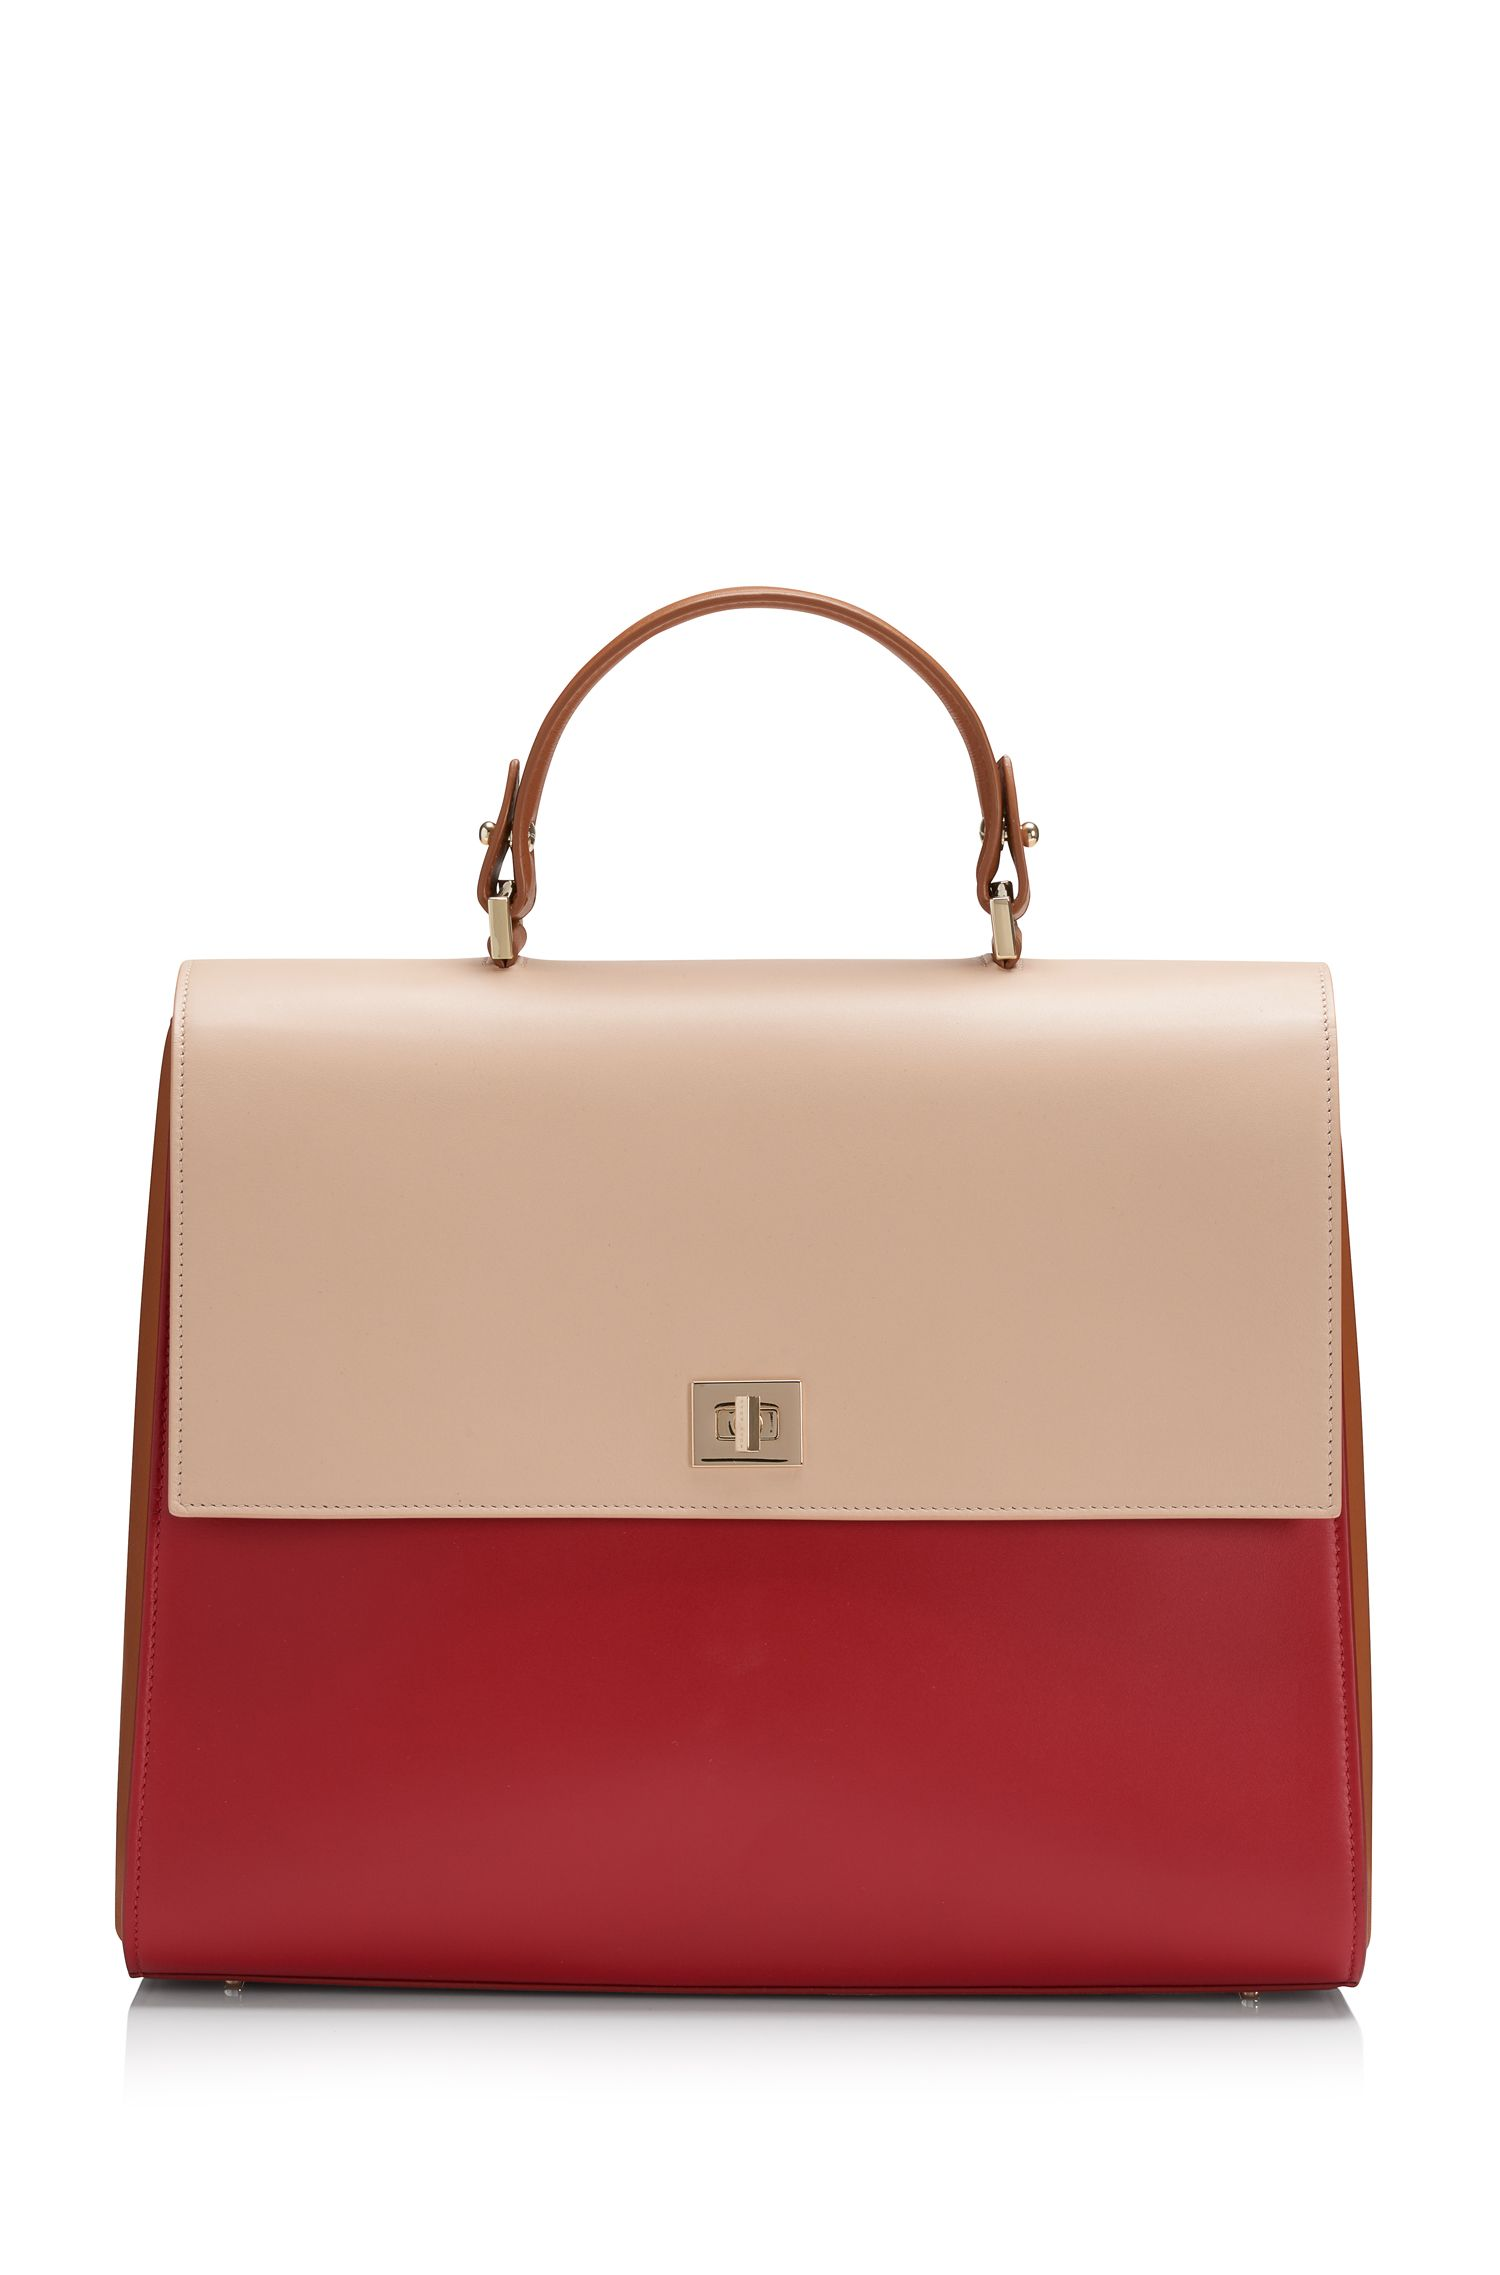 'Bespoke'    Leather Handbag, Detachable Strap